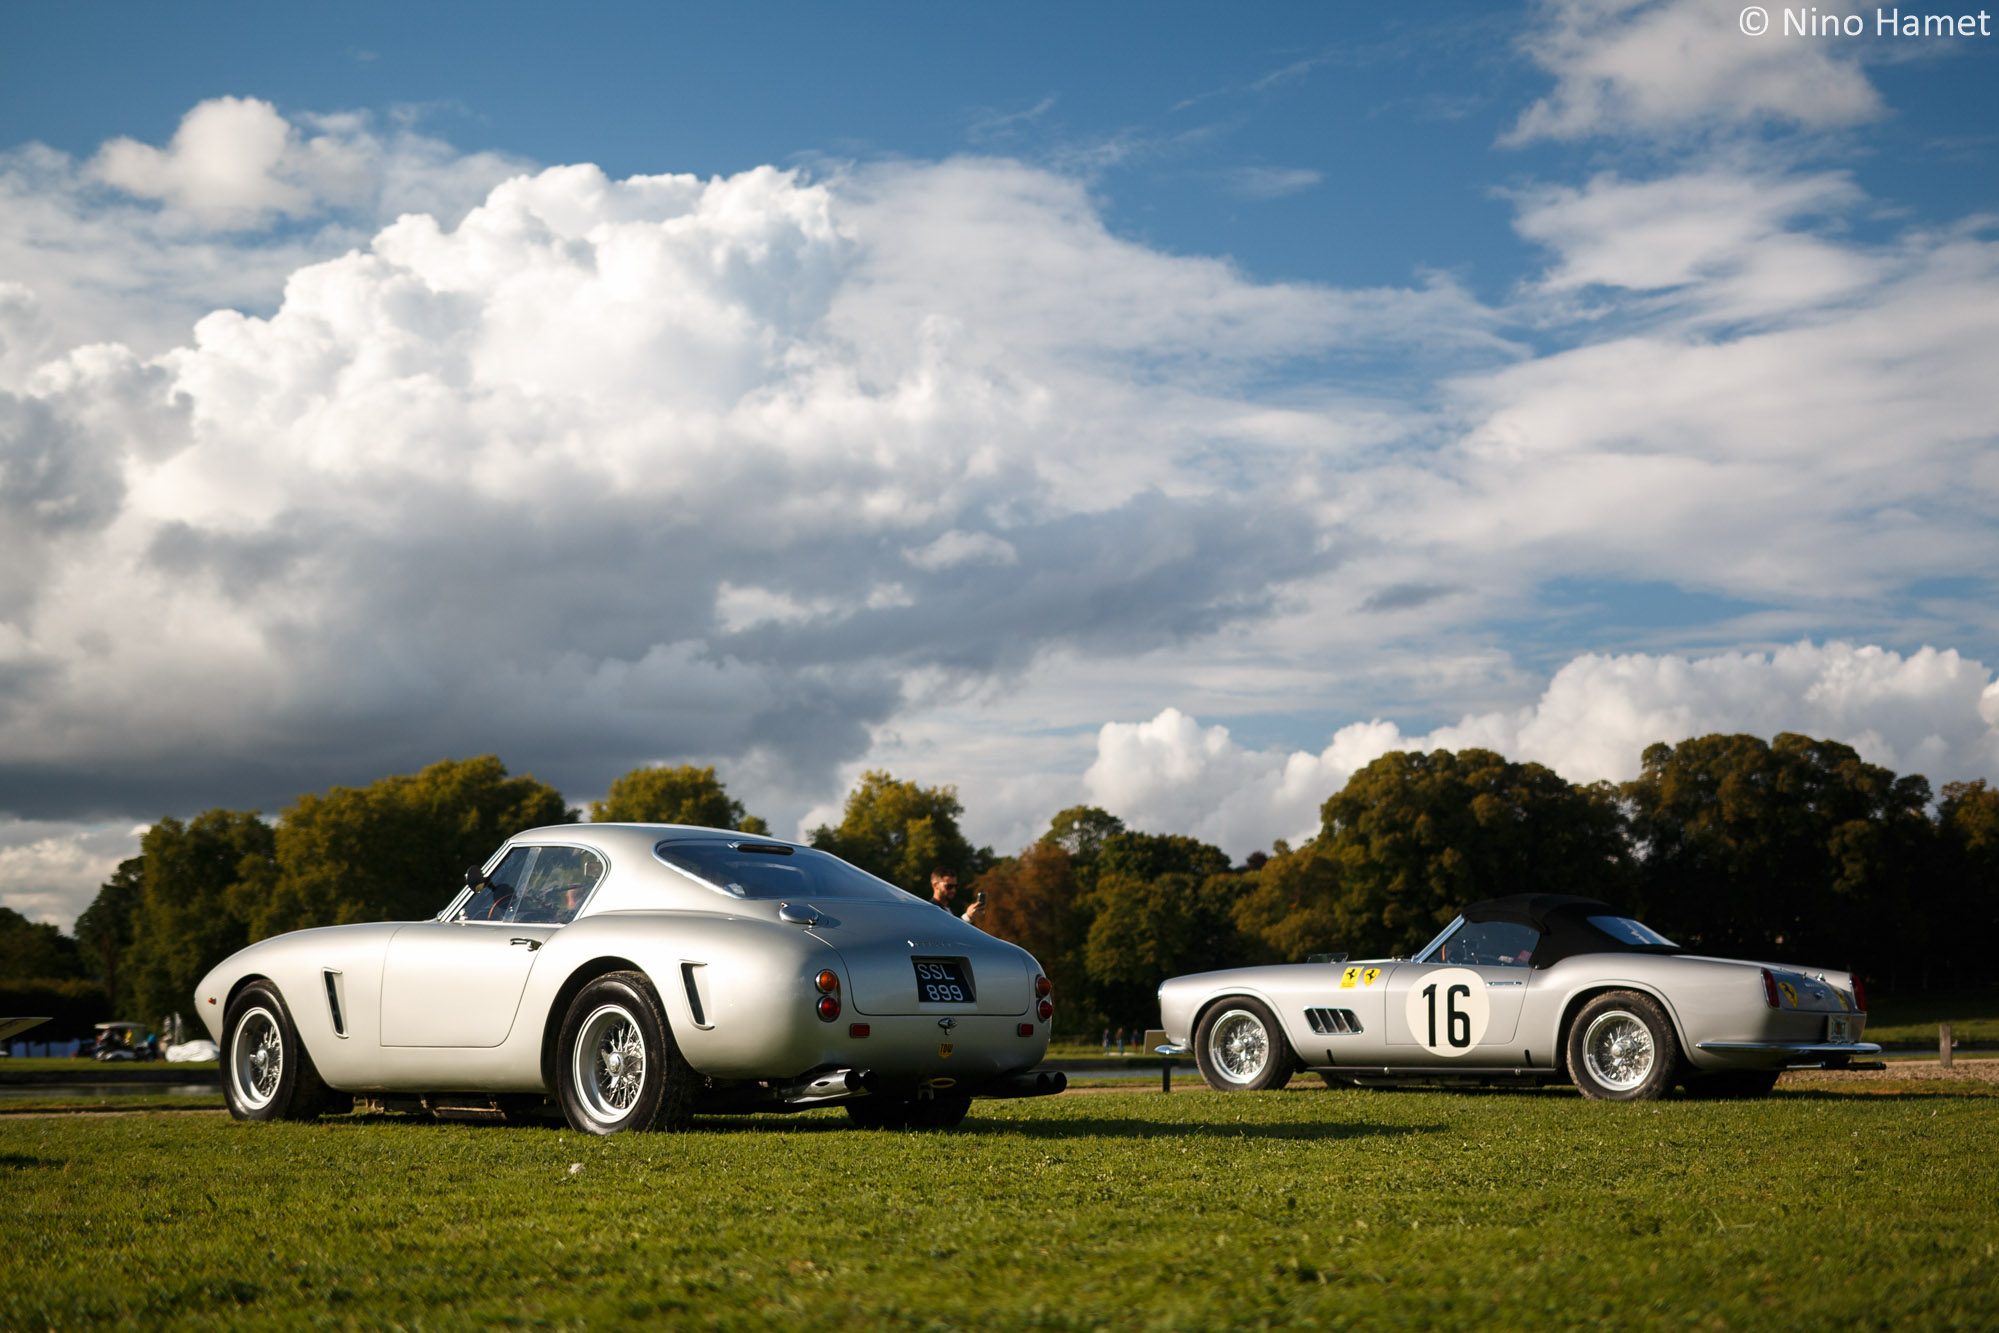 Ferrari 250 GT SWB #2129GT – 1960 & Ferrari 250 GT California Spyder #1451GT – 1959